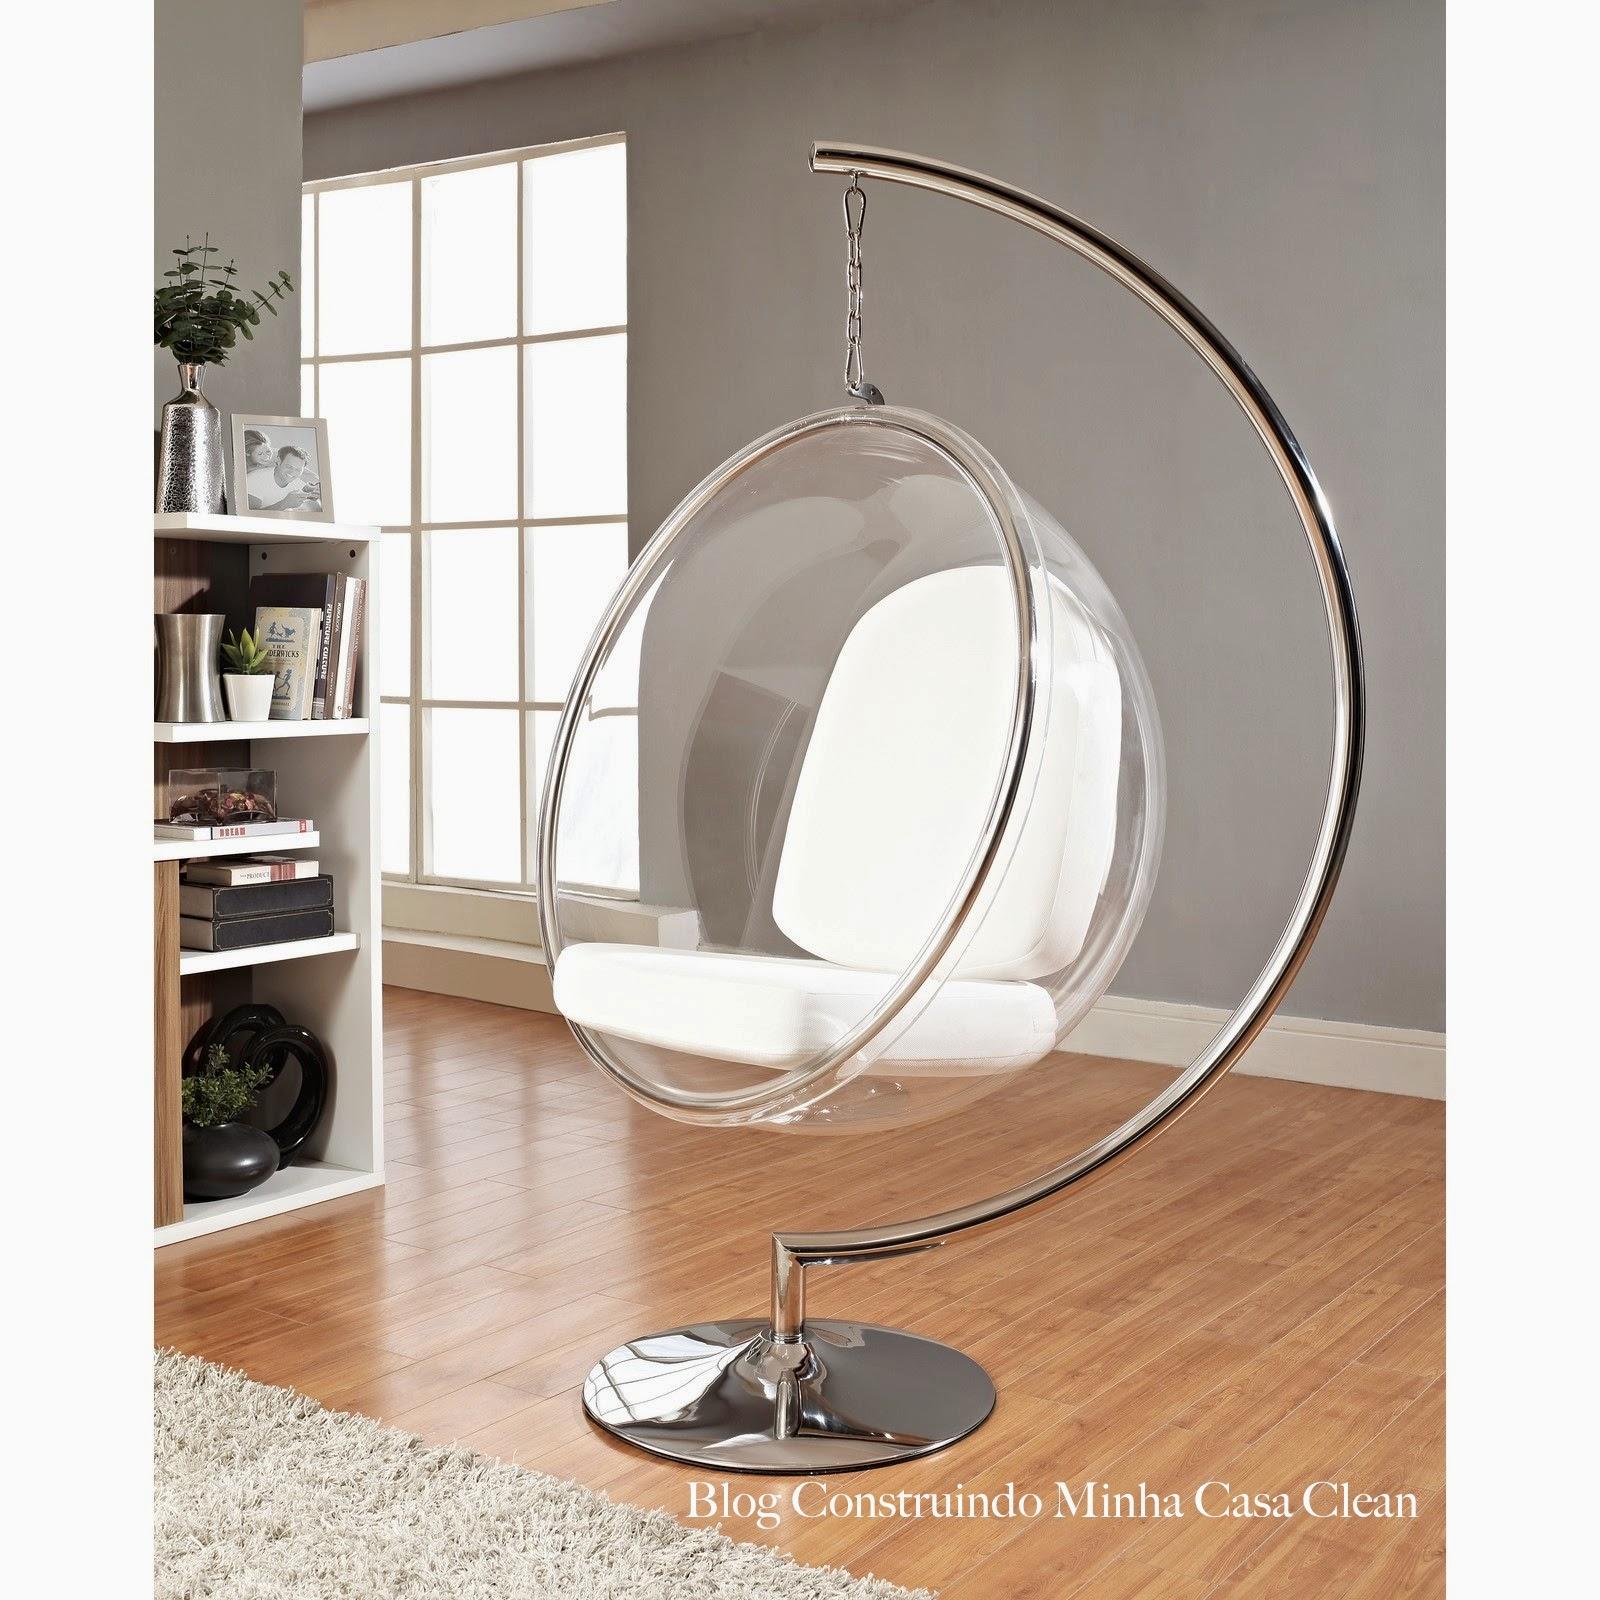 construindo minha casa clean cadeiras bubble chair a beleza dos ambientes com cadeiras flutuantes. Black Bedroom Furniture Sets. Home Design Ideas